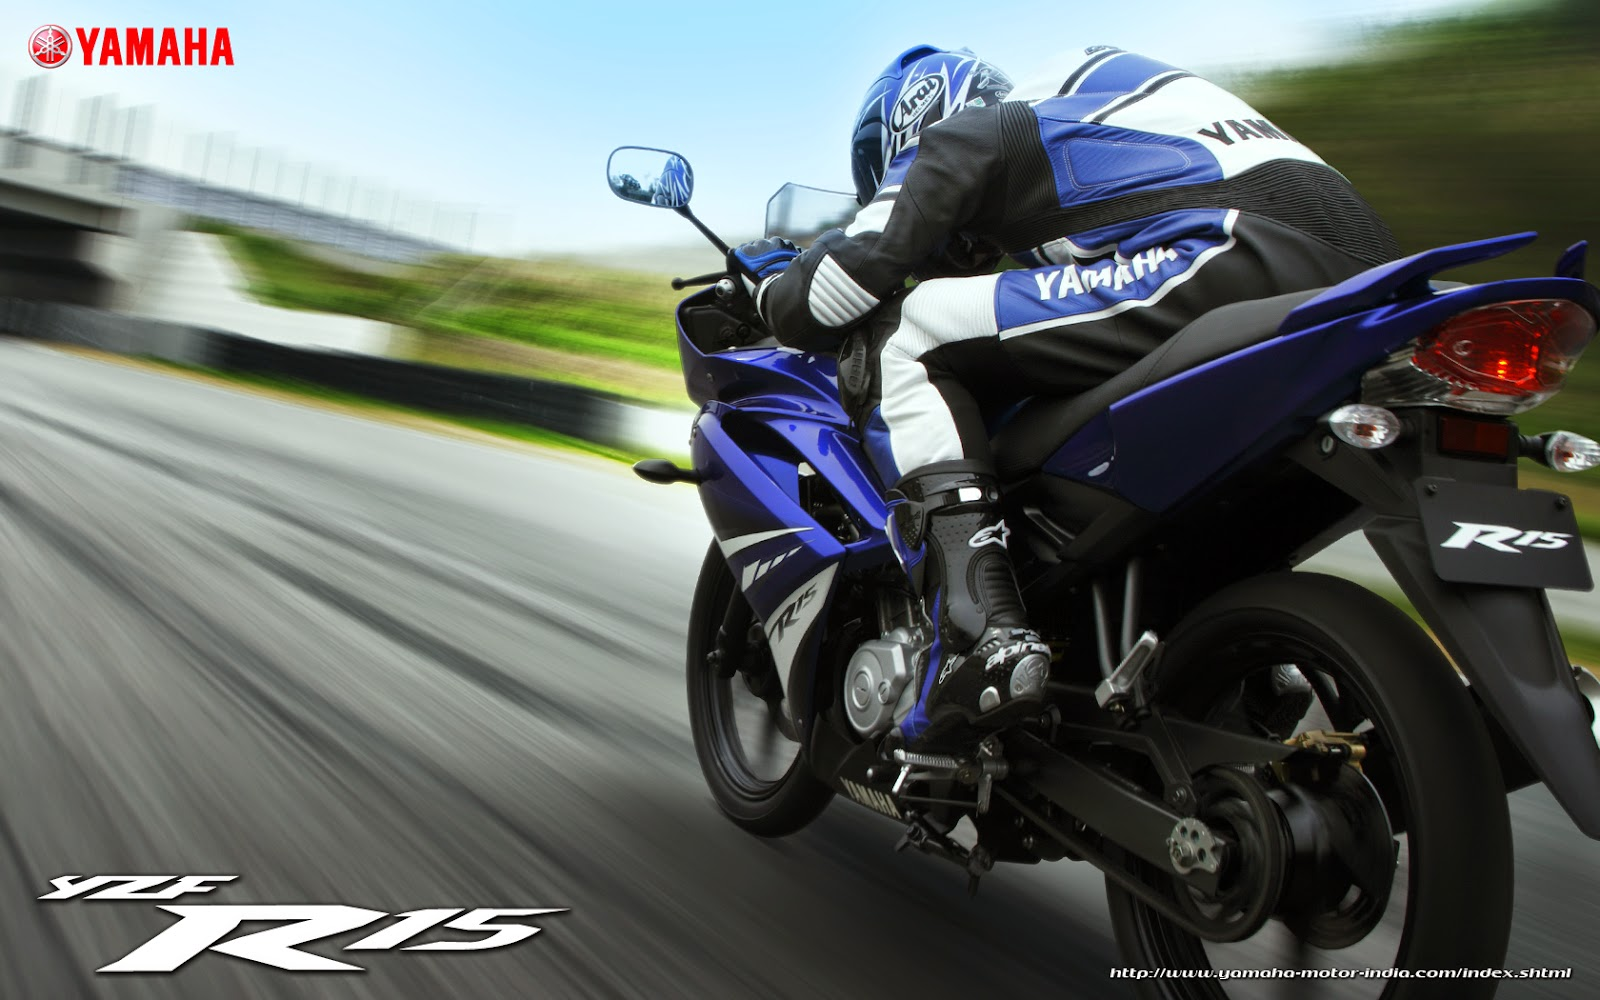 New Yamaha R15 Version 3 Yzf-r15 Version 3.0